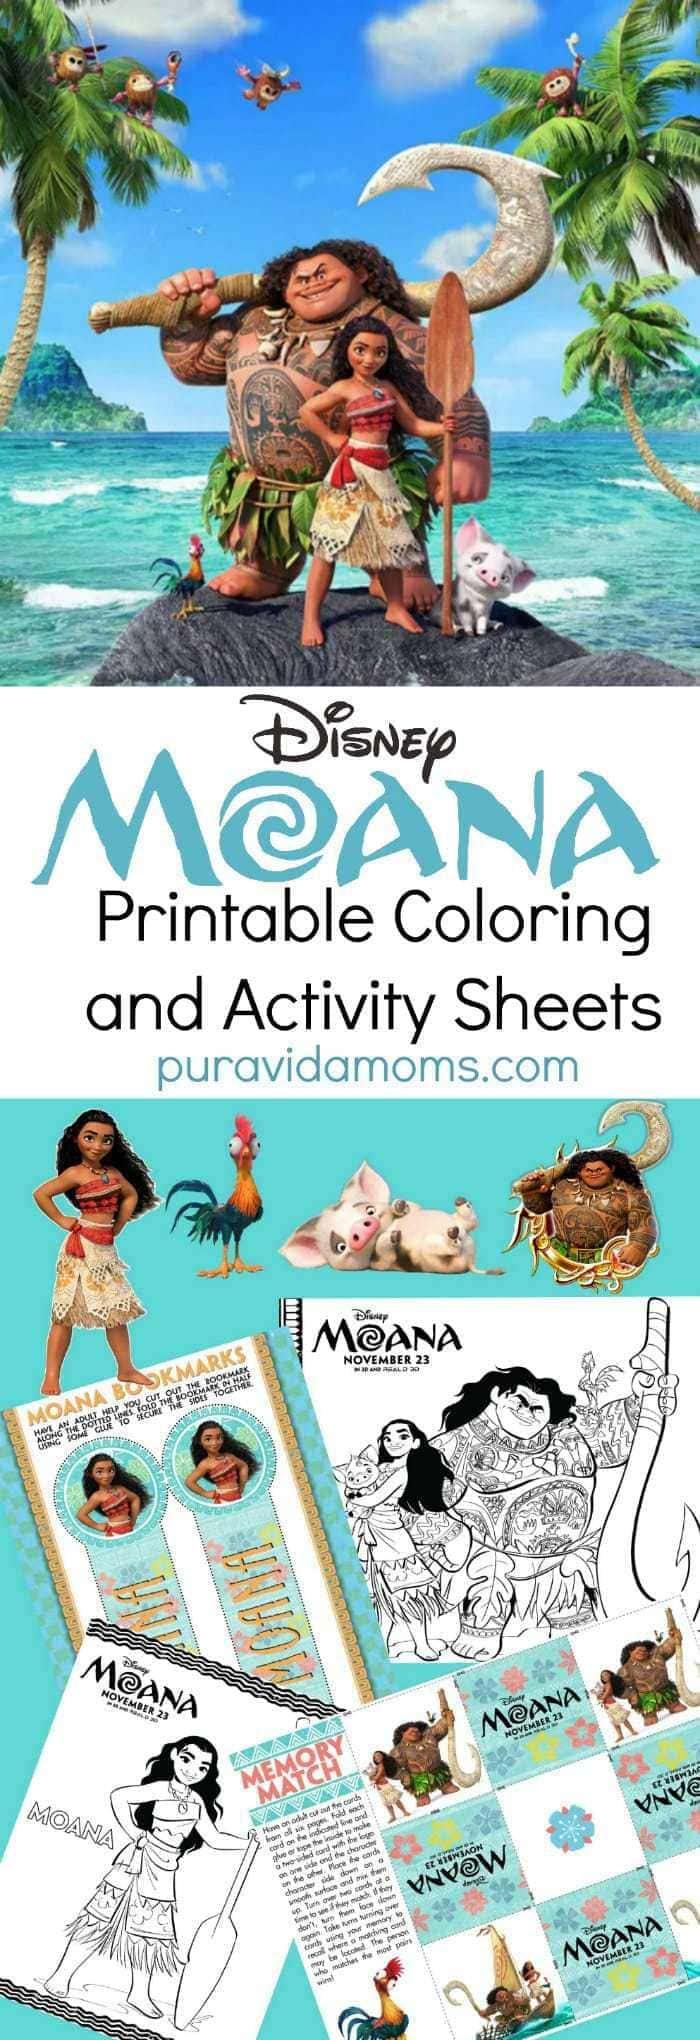 Moana Printable Coloring Sheets